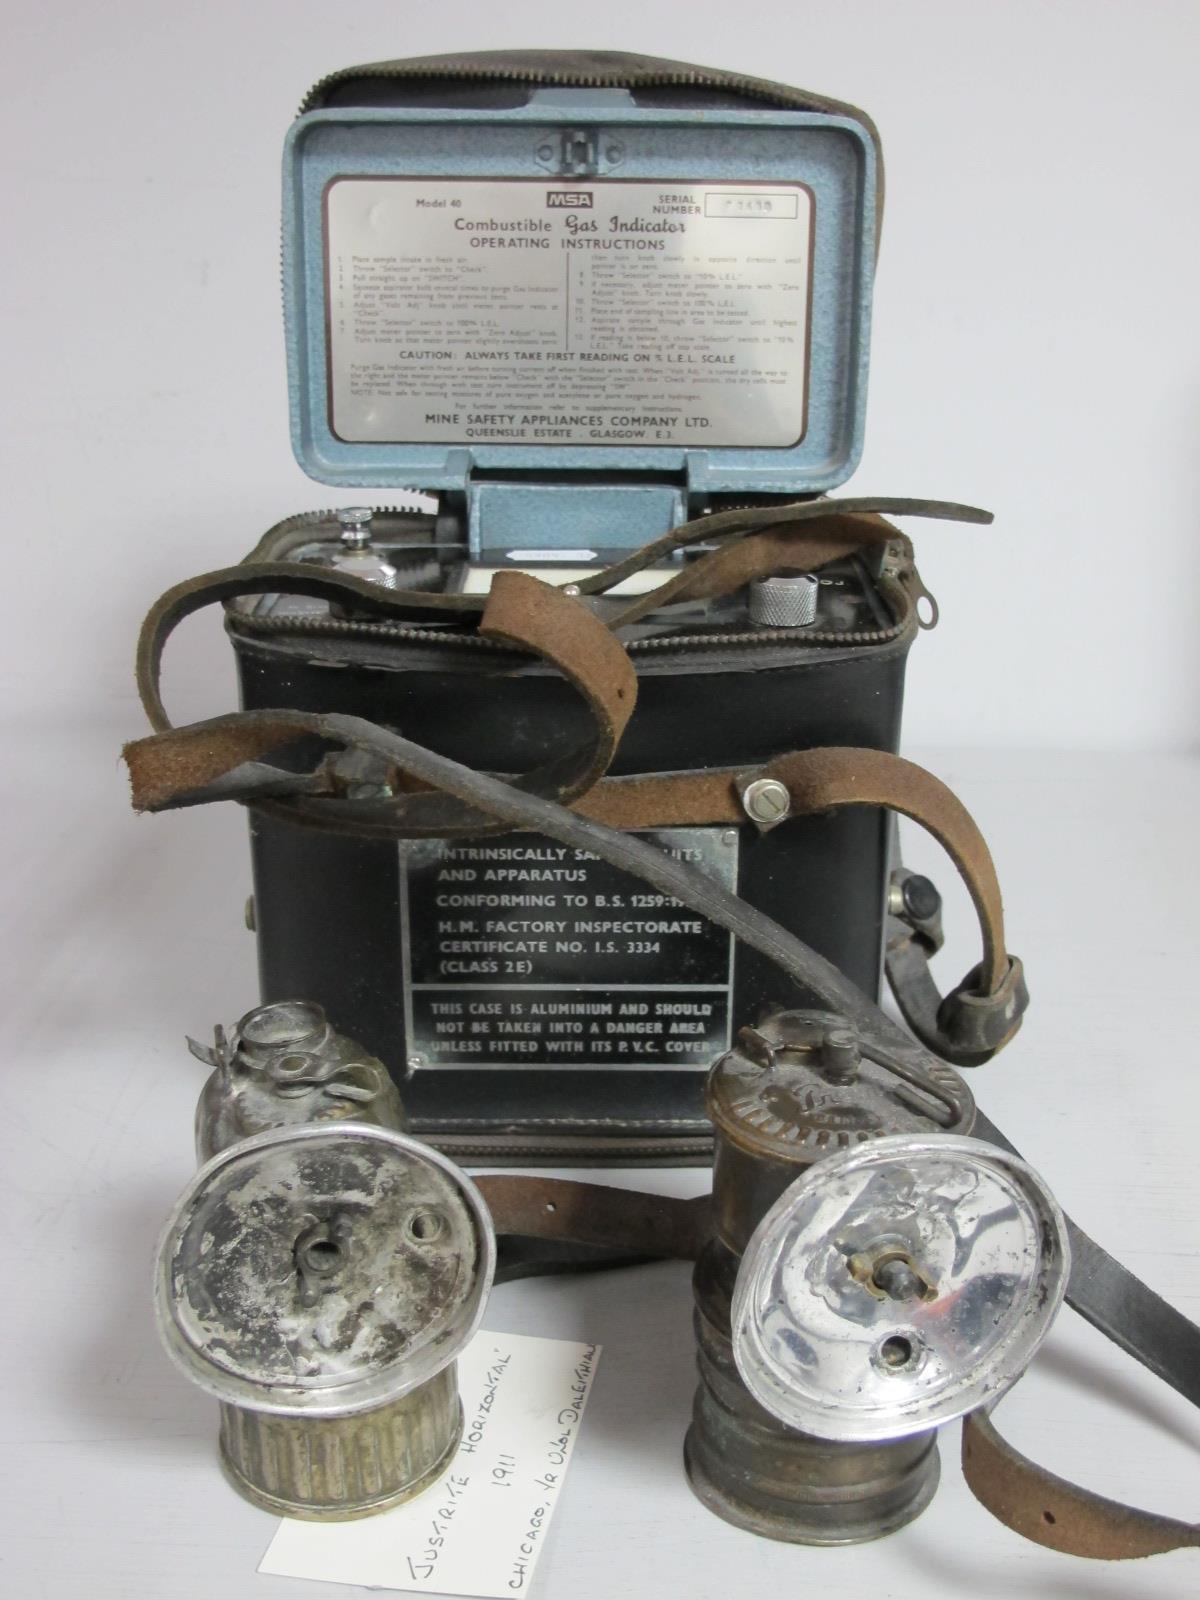 MSA Combustible Gas Indicator. Justrite Horizontal Carbide Lamp, circa 1911, Premier of Leeds